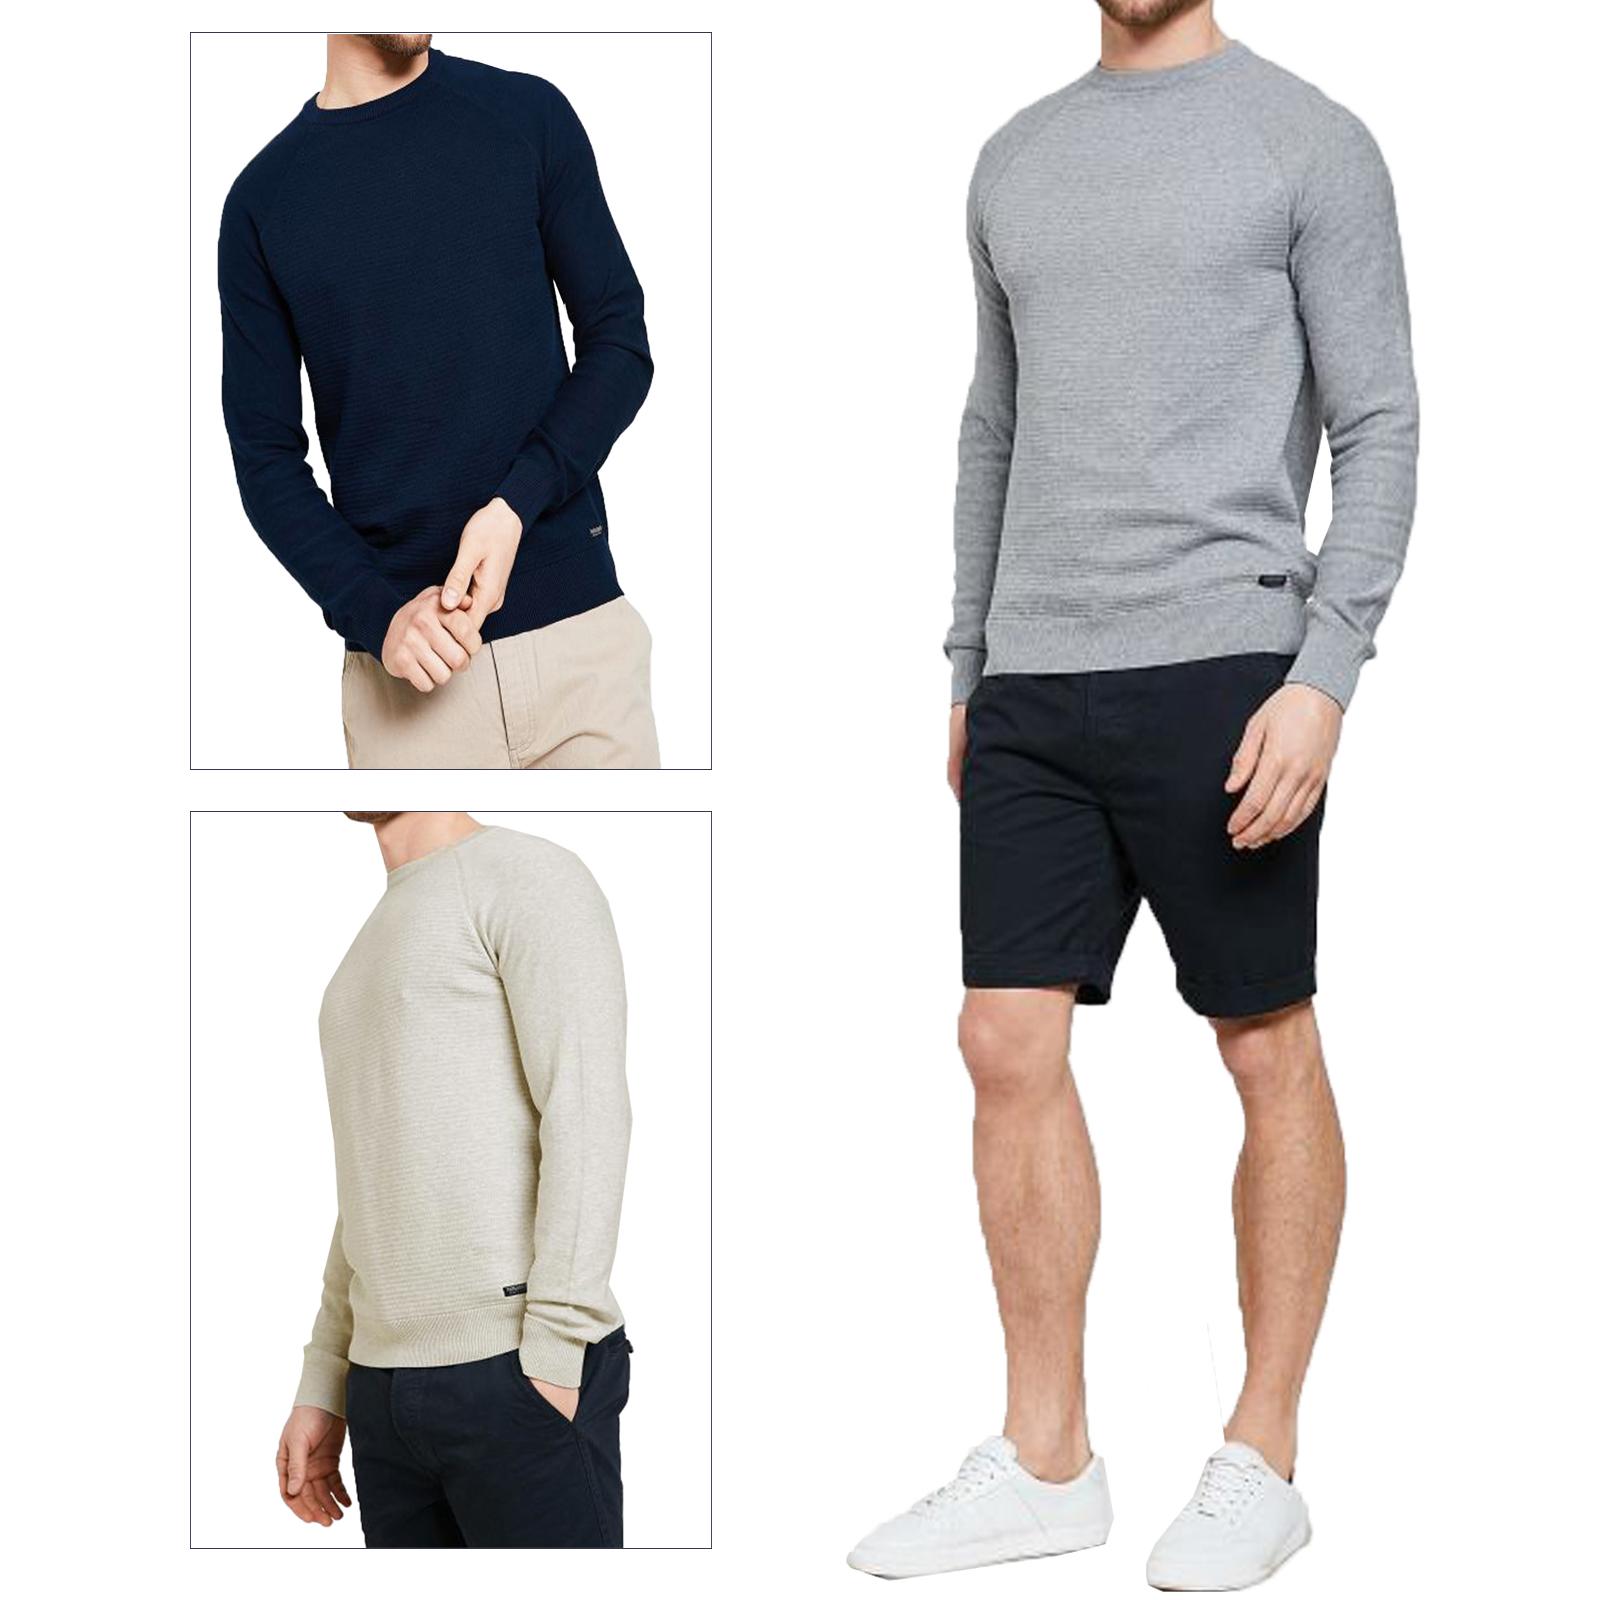 Threadbare Mens Donald Jumper Designer Long Sleeved Knitted Cotton Sweater